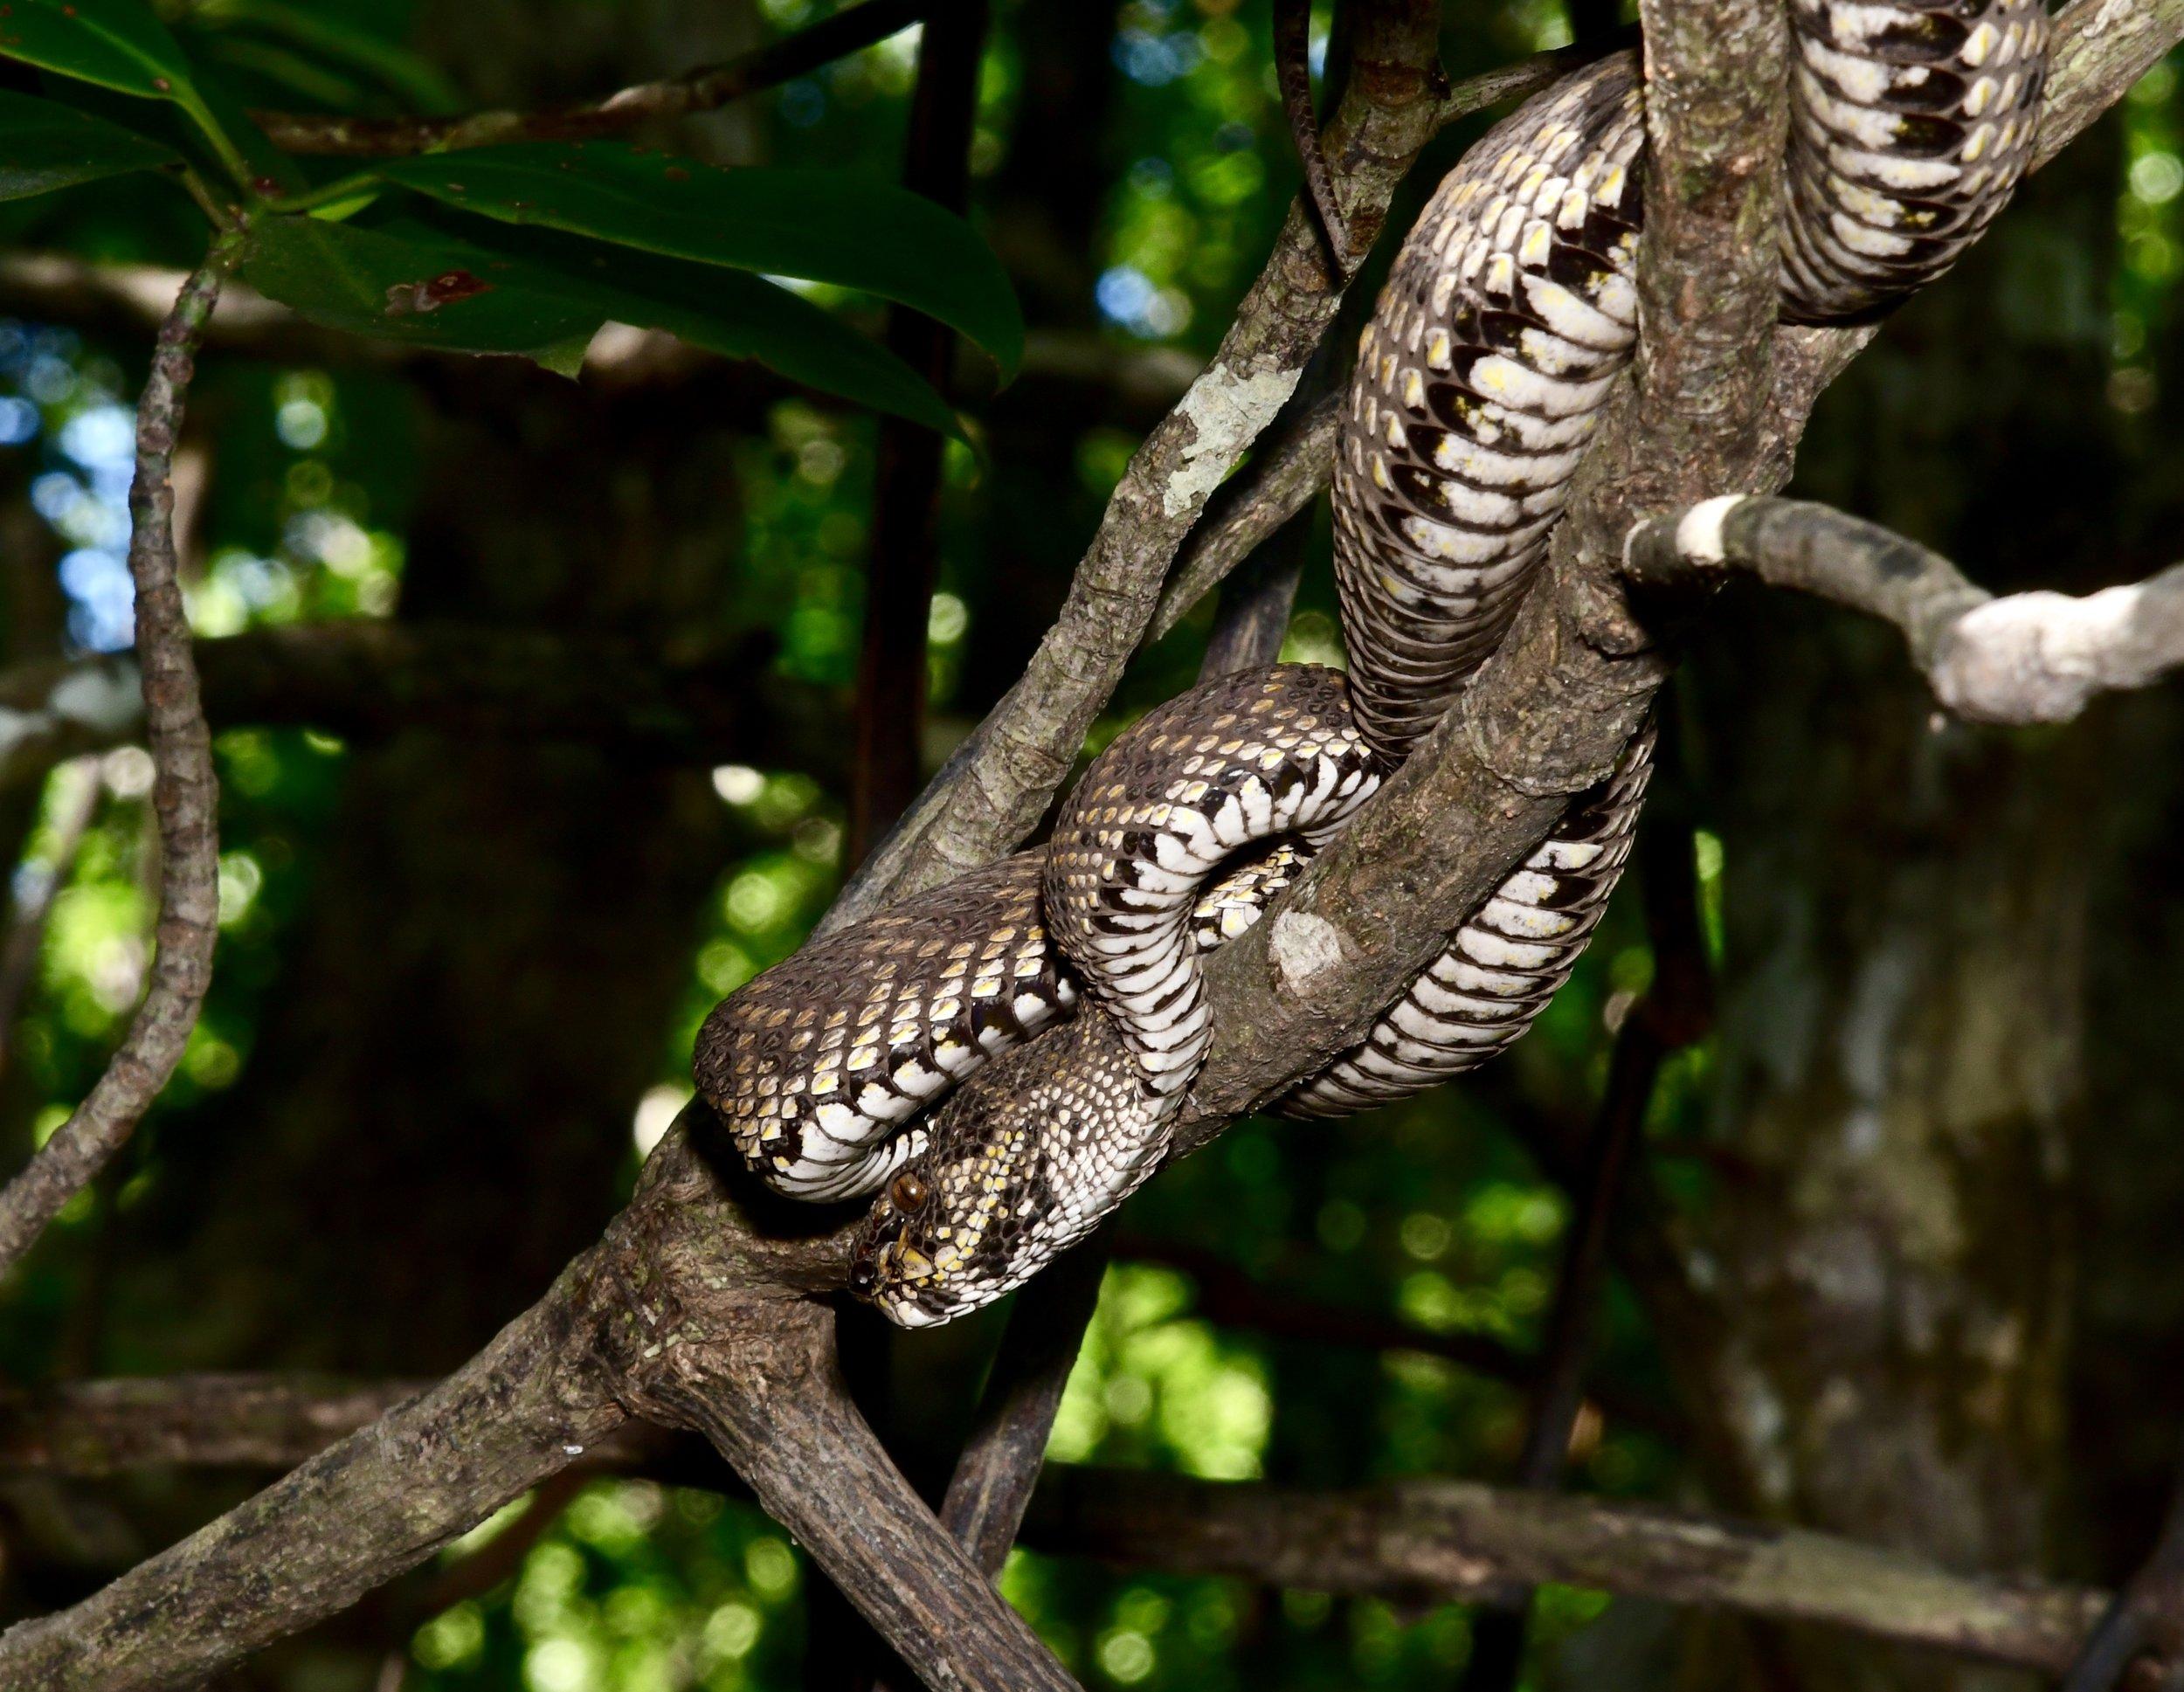 Mangrove Pitviper ( Trimeresurus purpeomaculatus ), Tanjung Rhu ,  Langkawi Island, Malaysia  • Nikon D500, Nikon 24-120mm f/4 @ 120mm, Nikon SB900 with softbox, ISO100, f/16, 1/60s